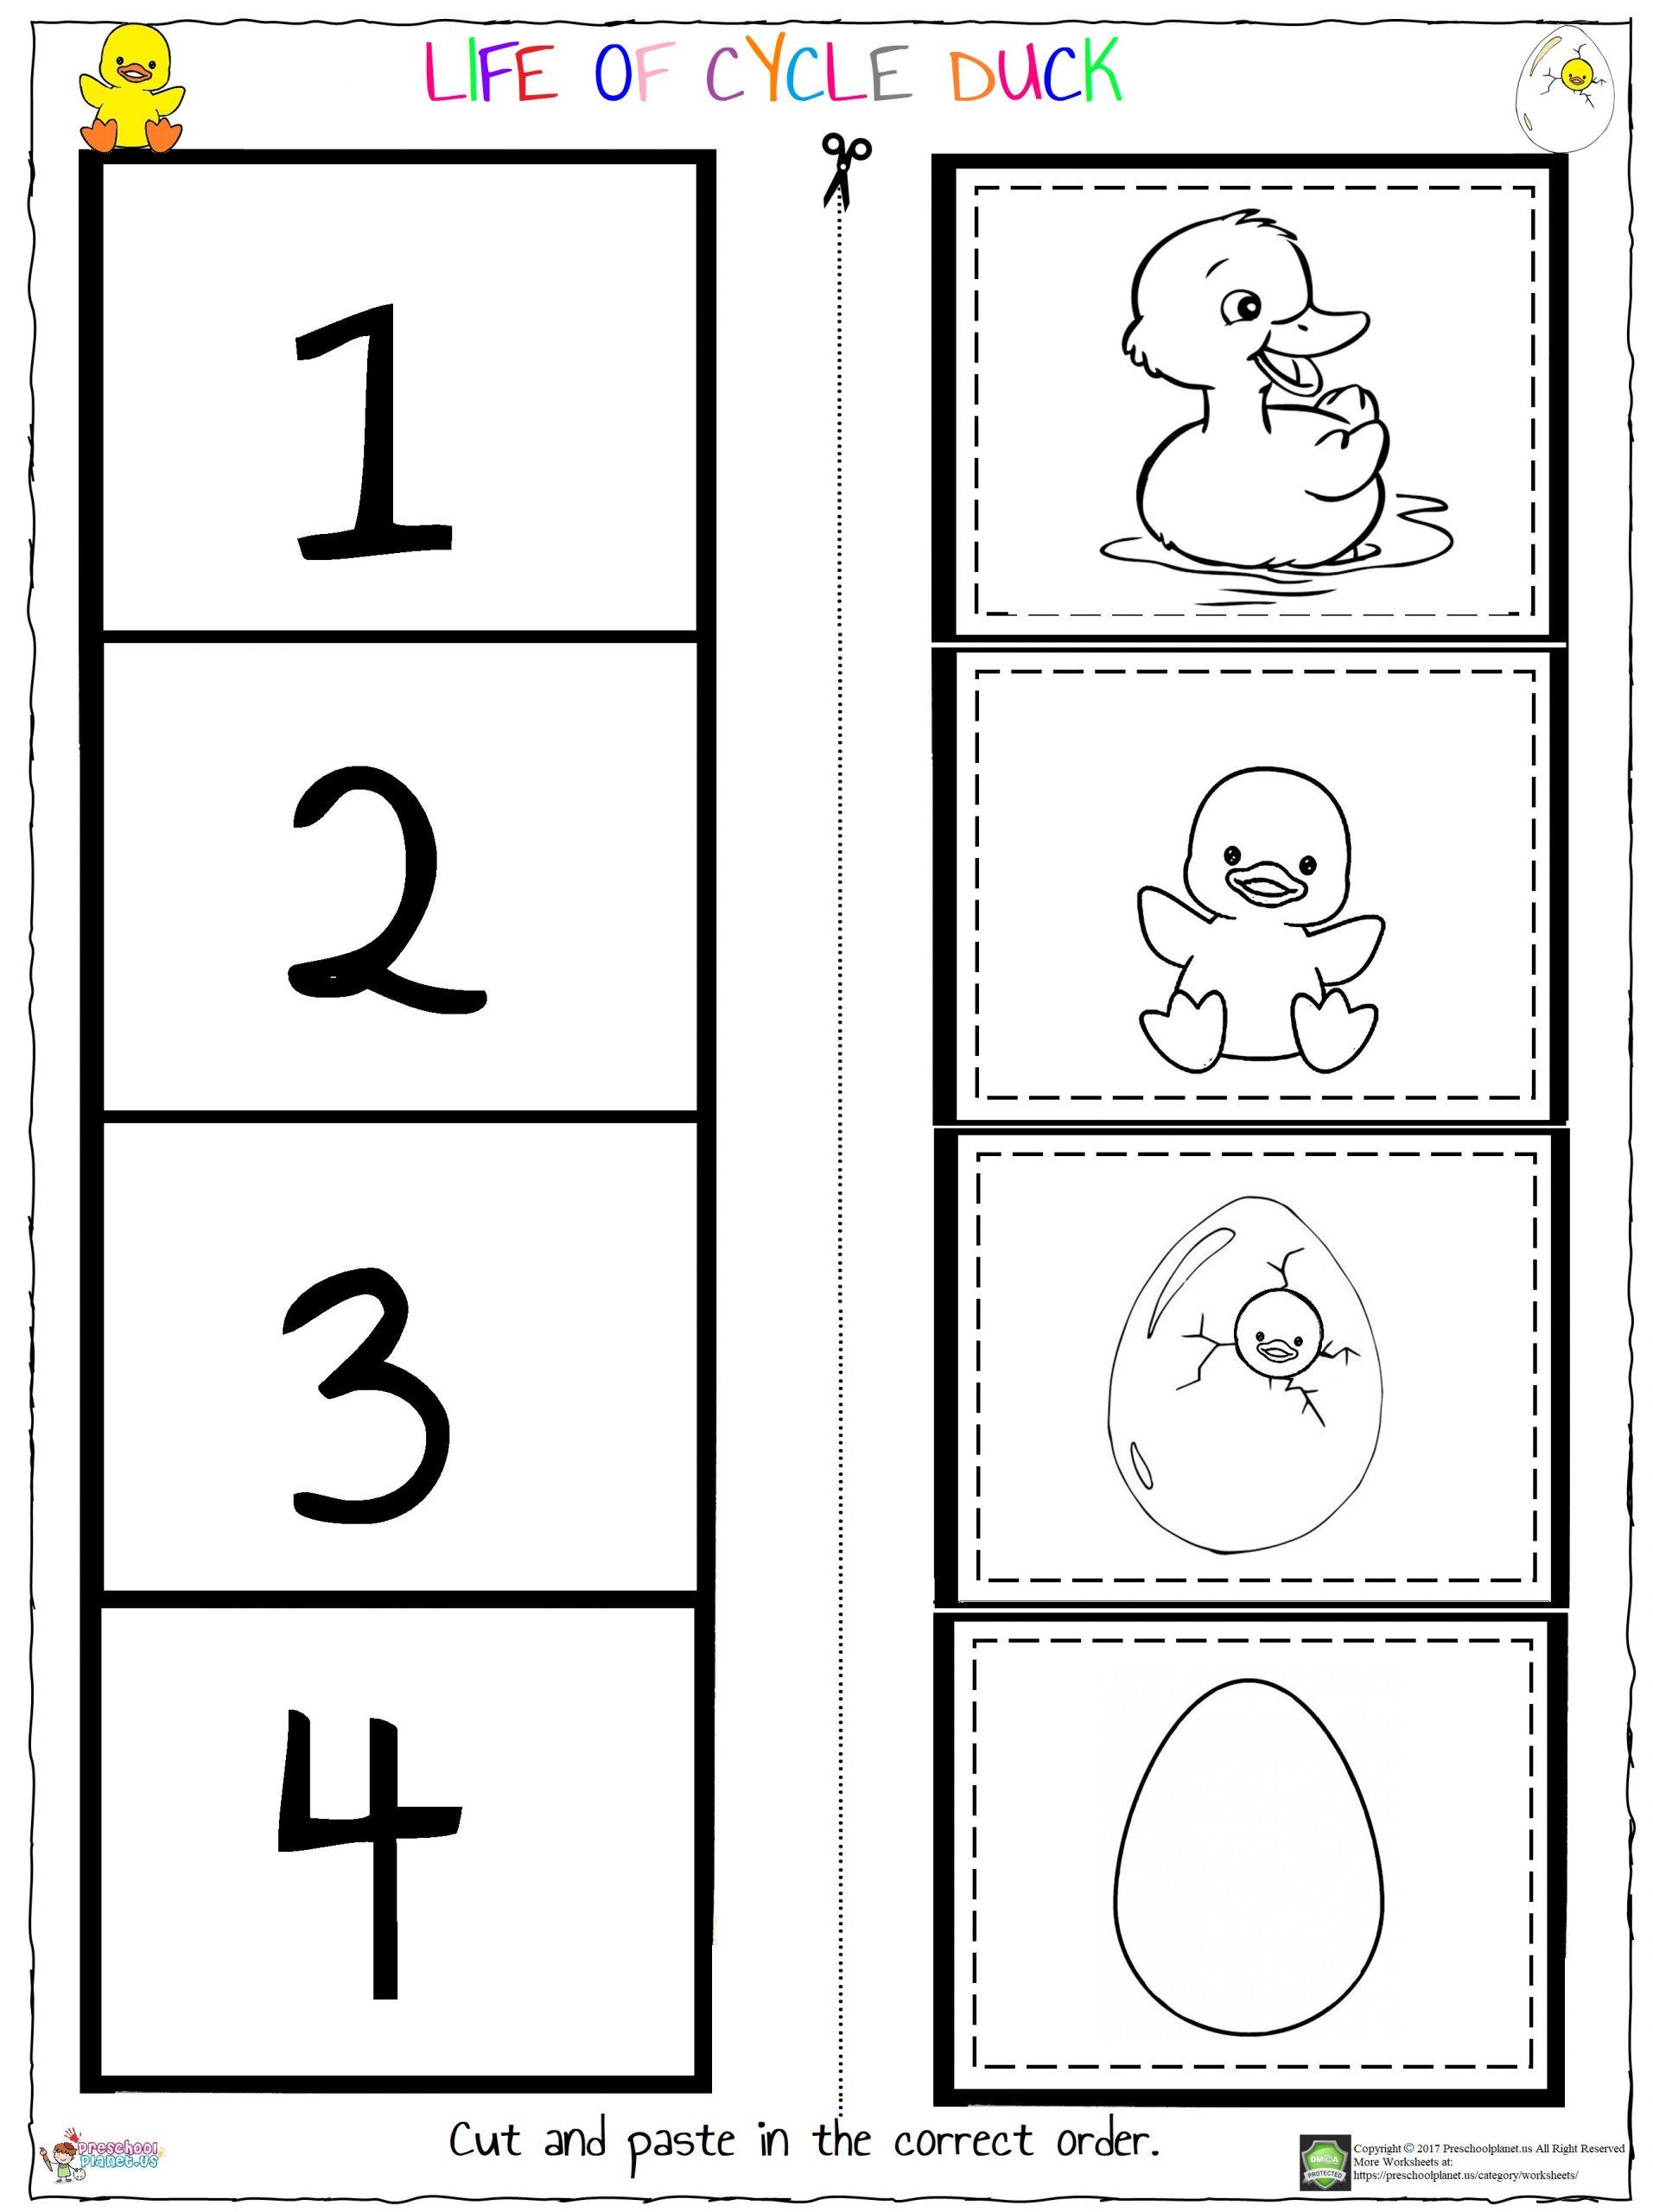 Preschoolplanet Preschool Craft Ideas And Worksheets